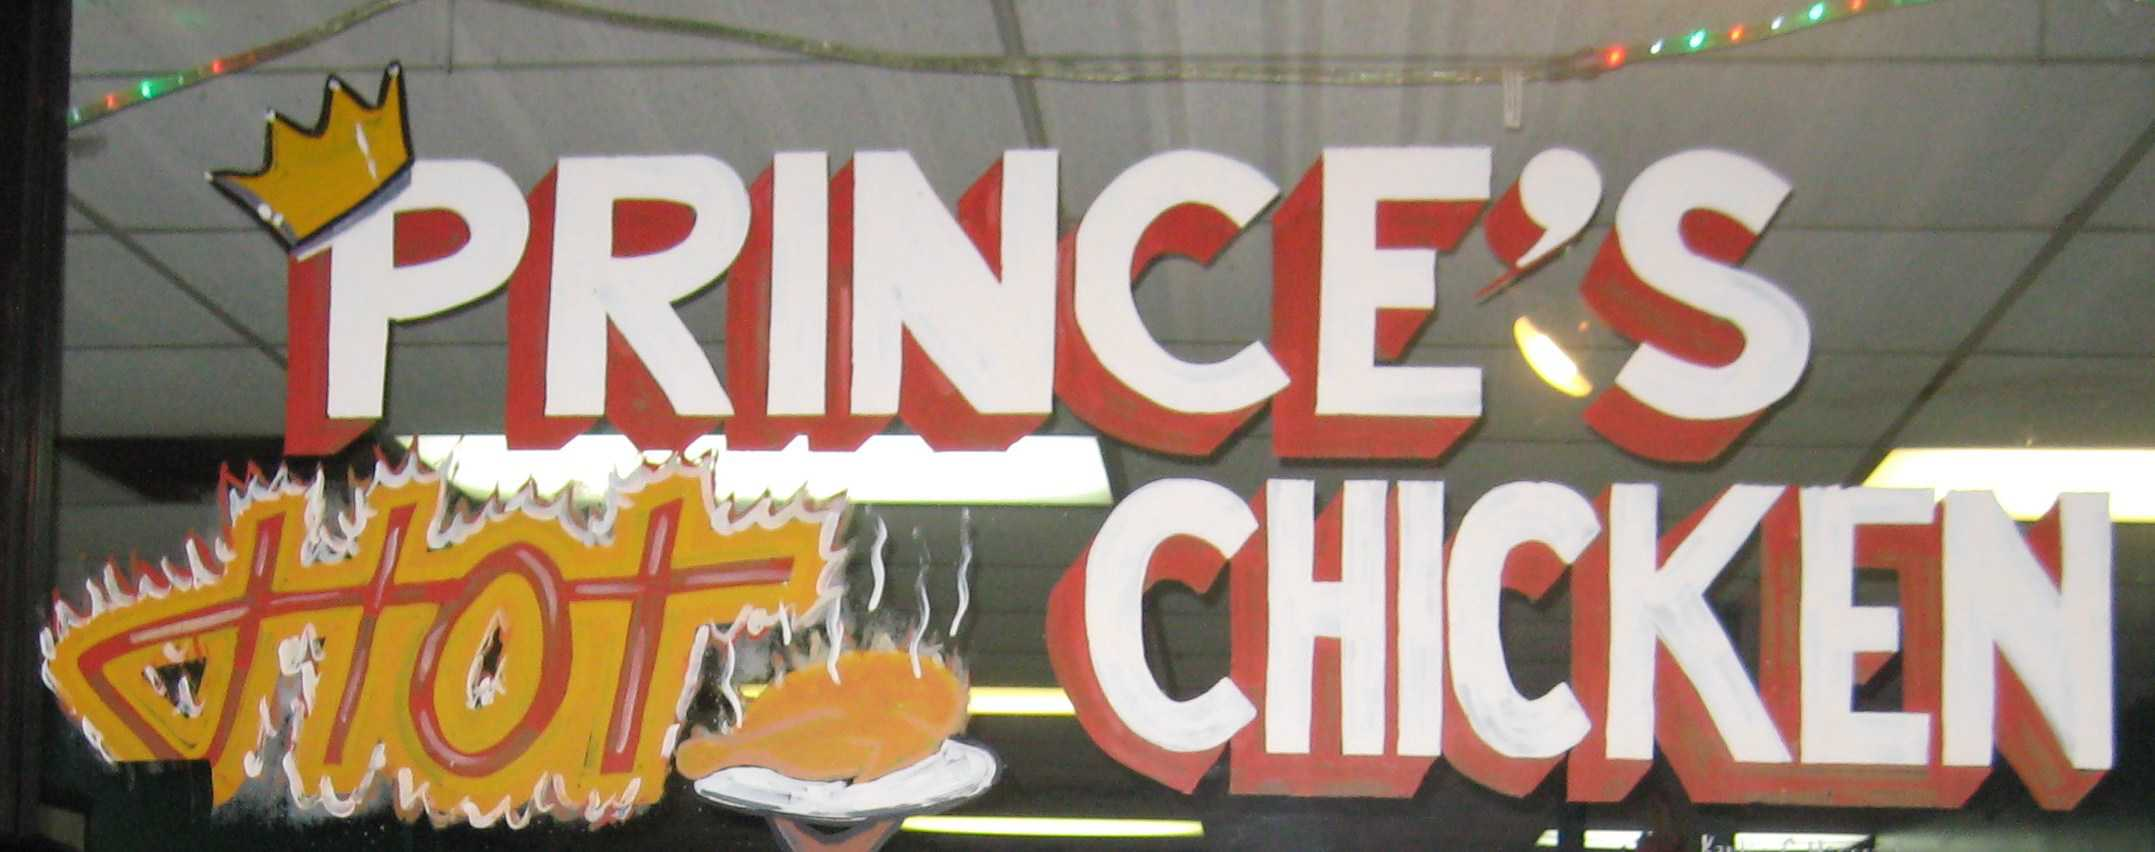 Prince's Chicken